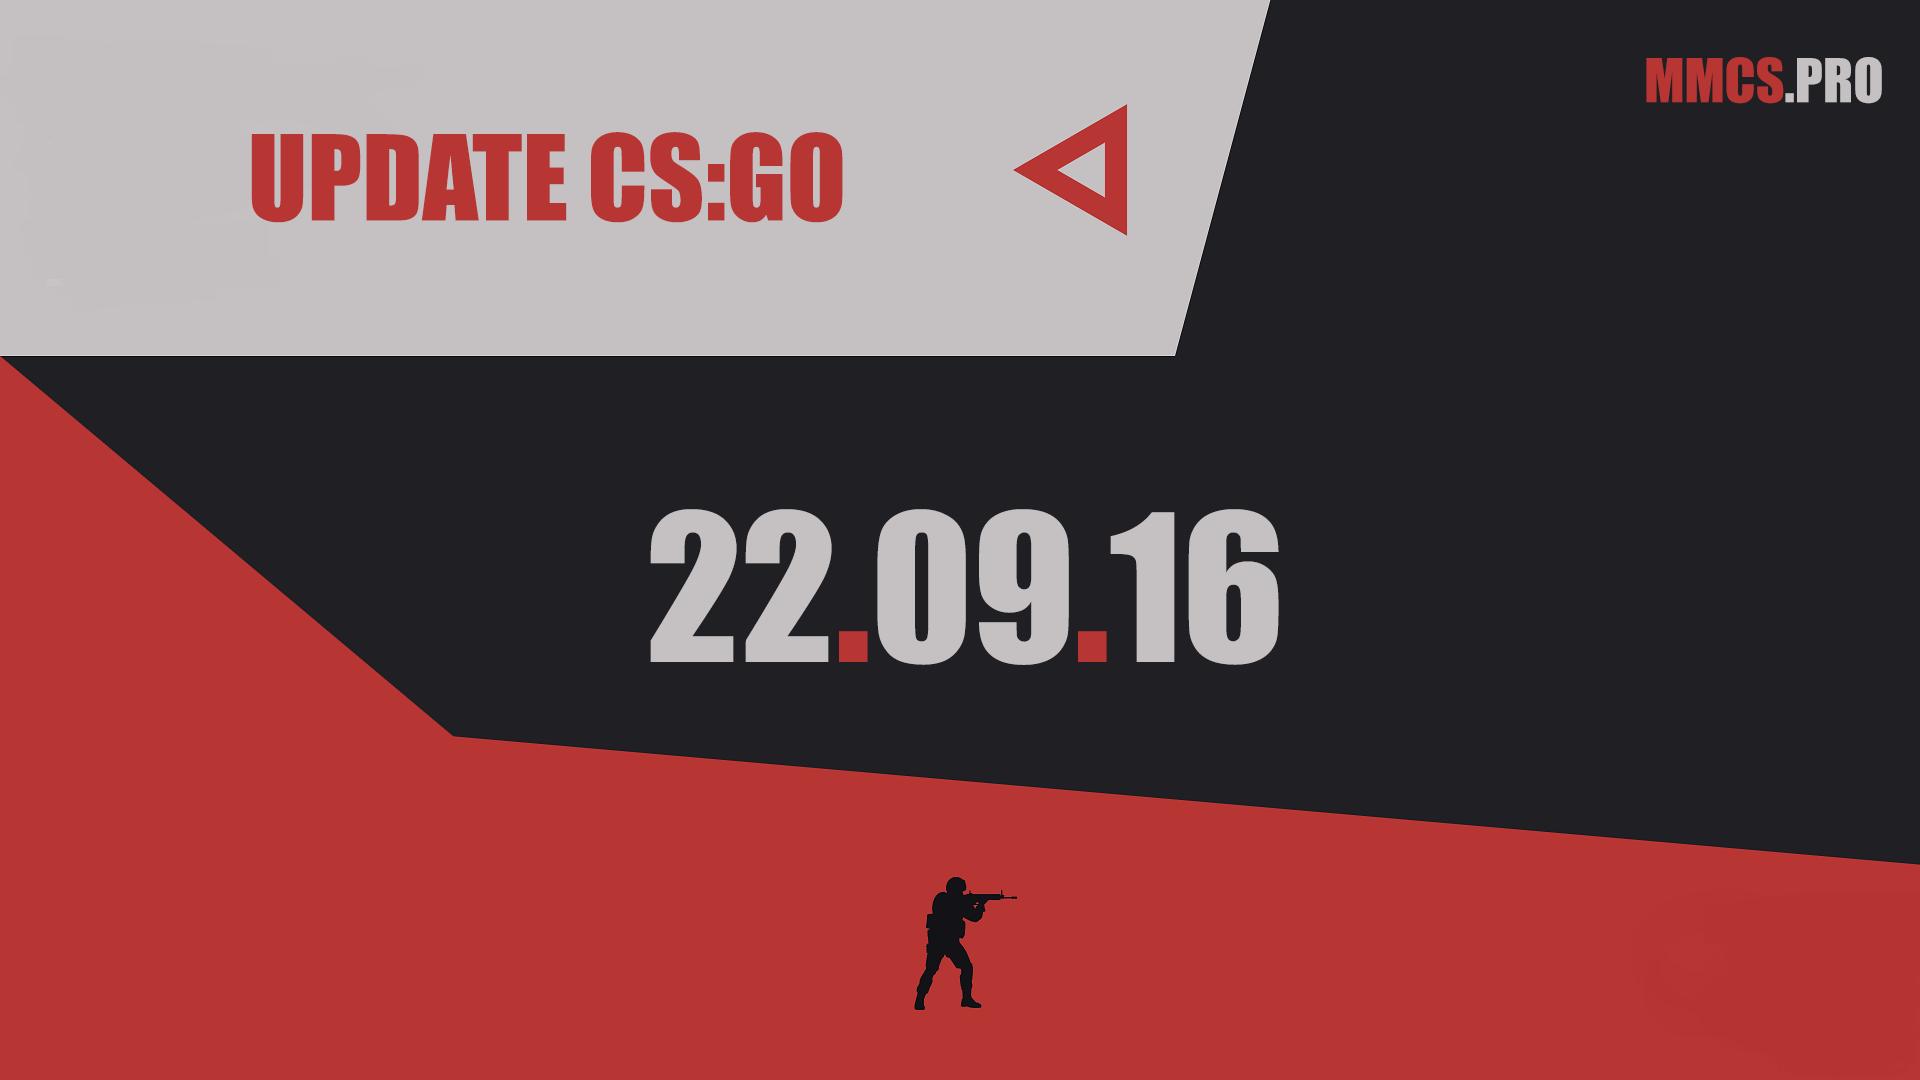 https://mmcs.pro/update-csgo-22-09-2016-valve/